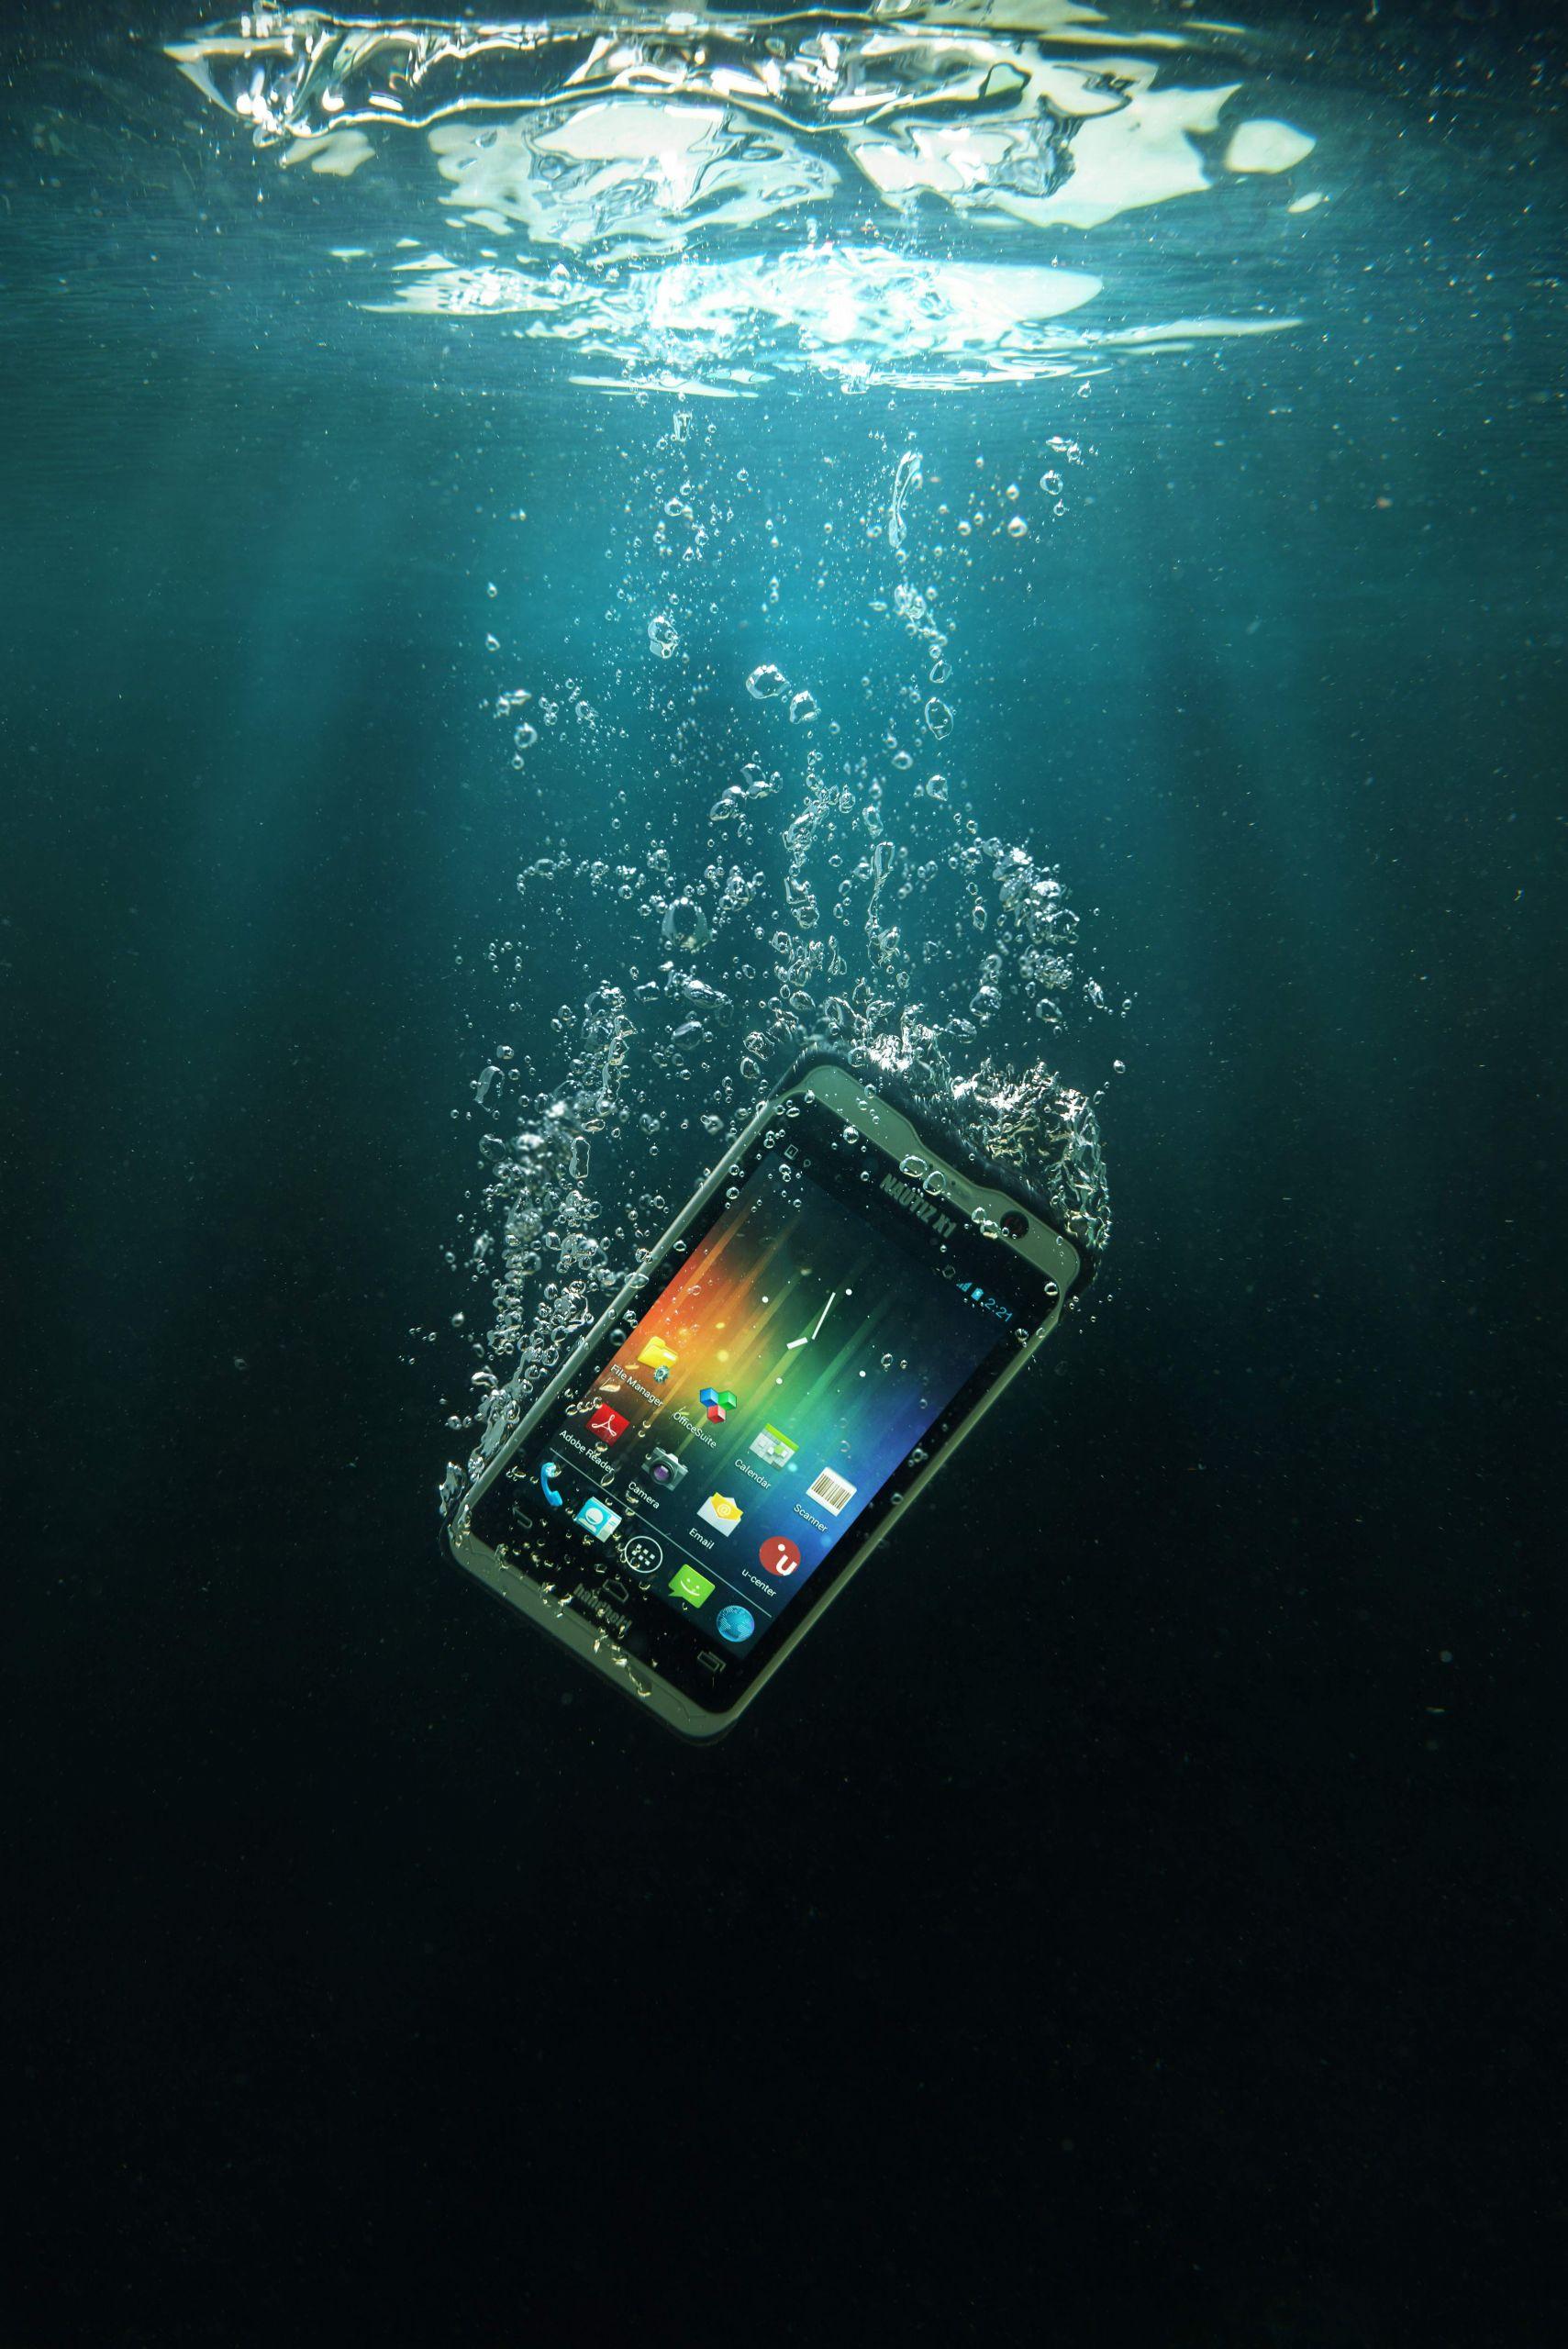 Nautiz X1 ultra rugged smartphone waterproof